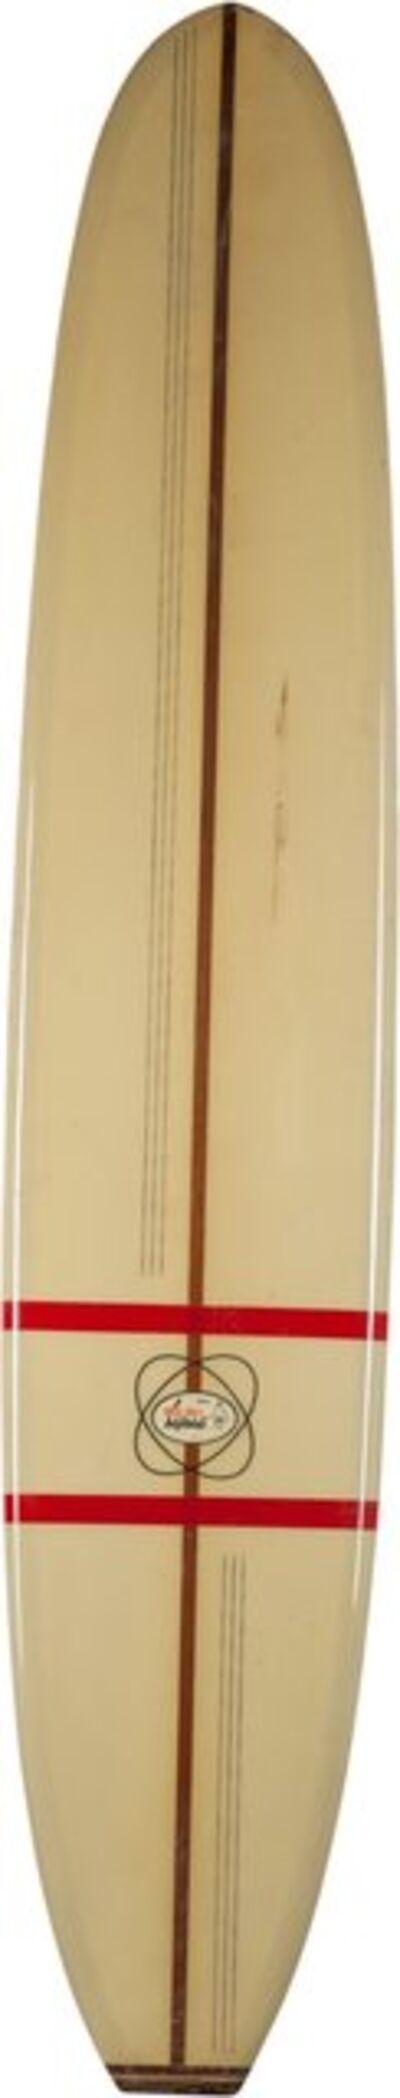 Greg Noll, 'Vintage Surfboard', 1960's